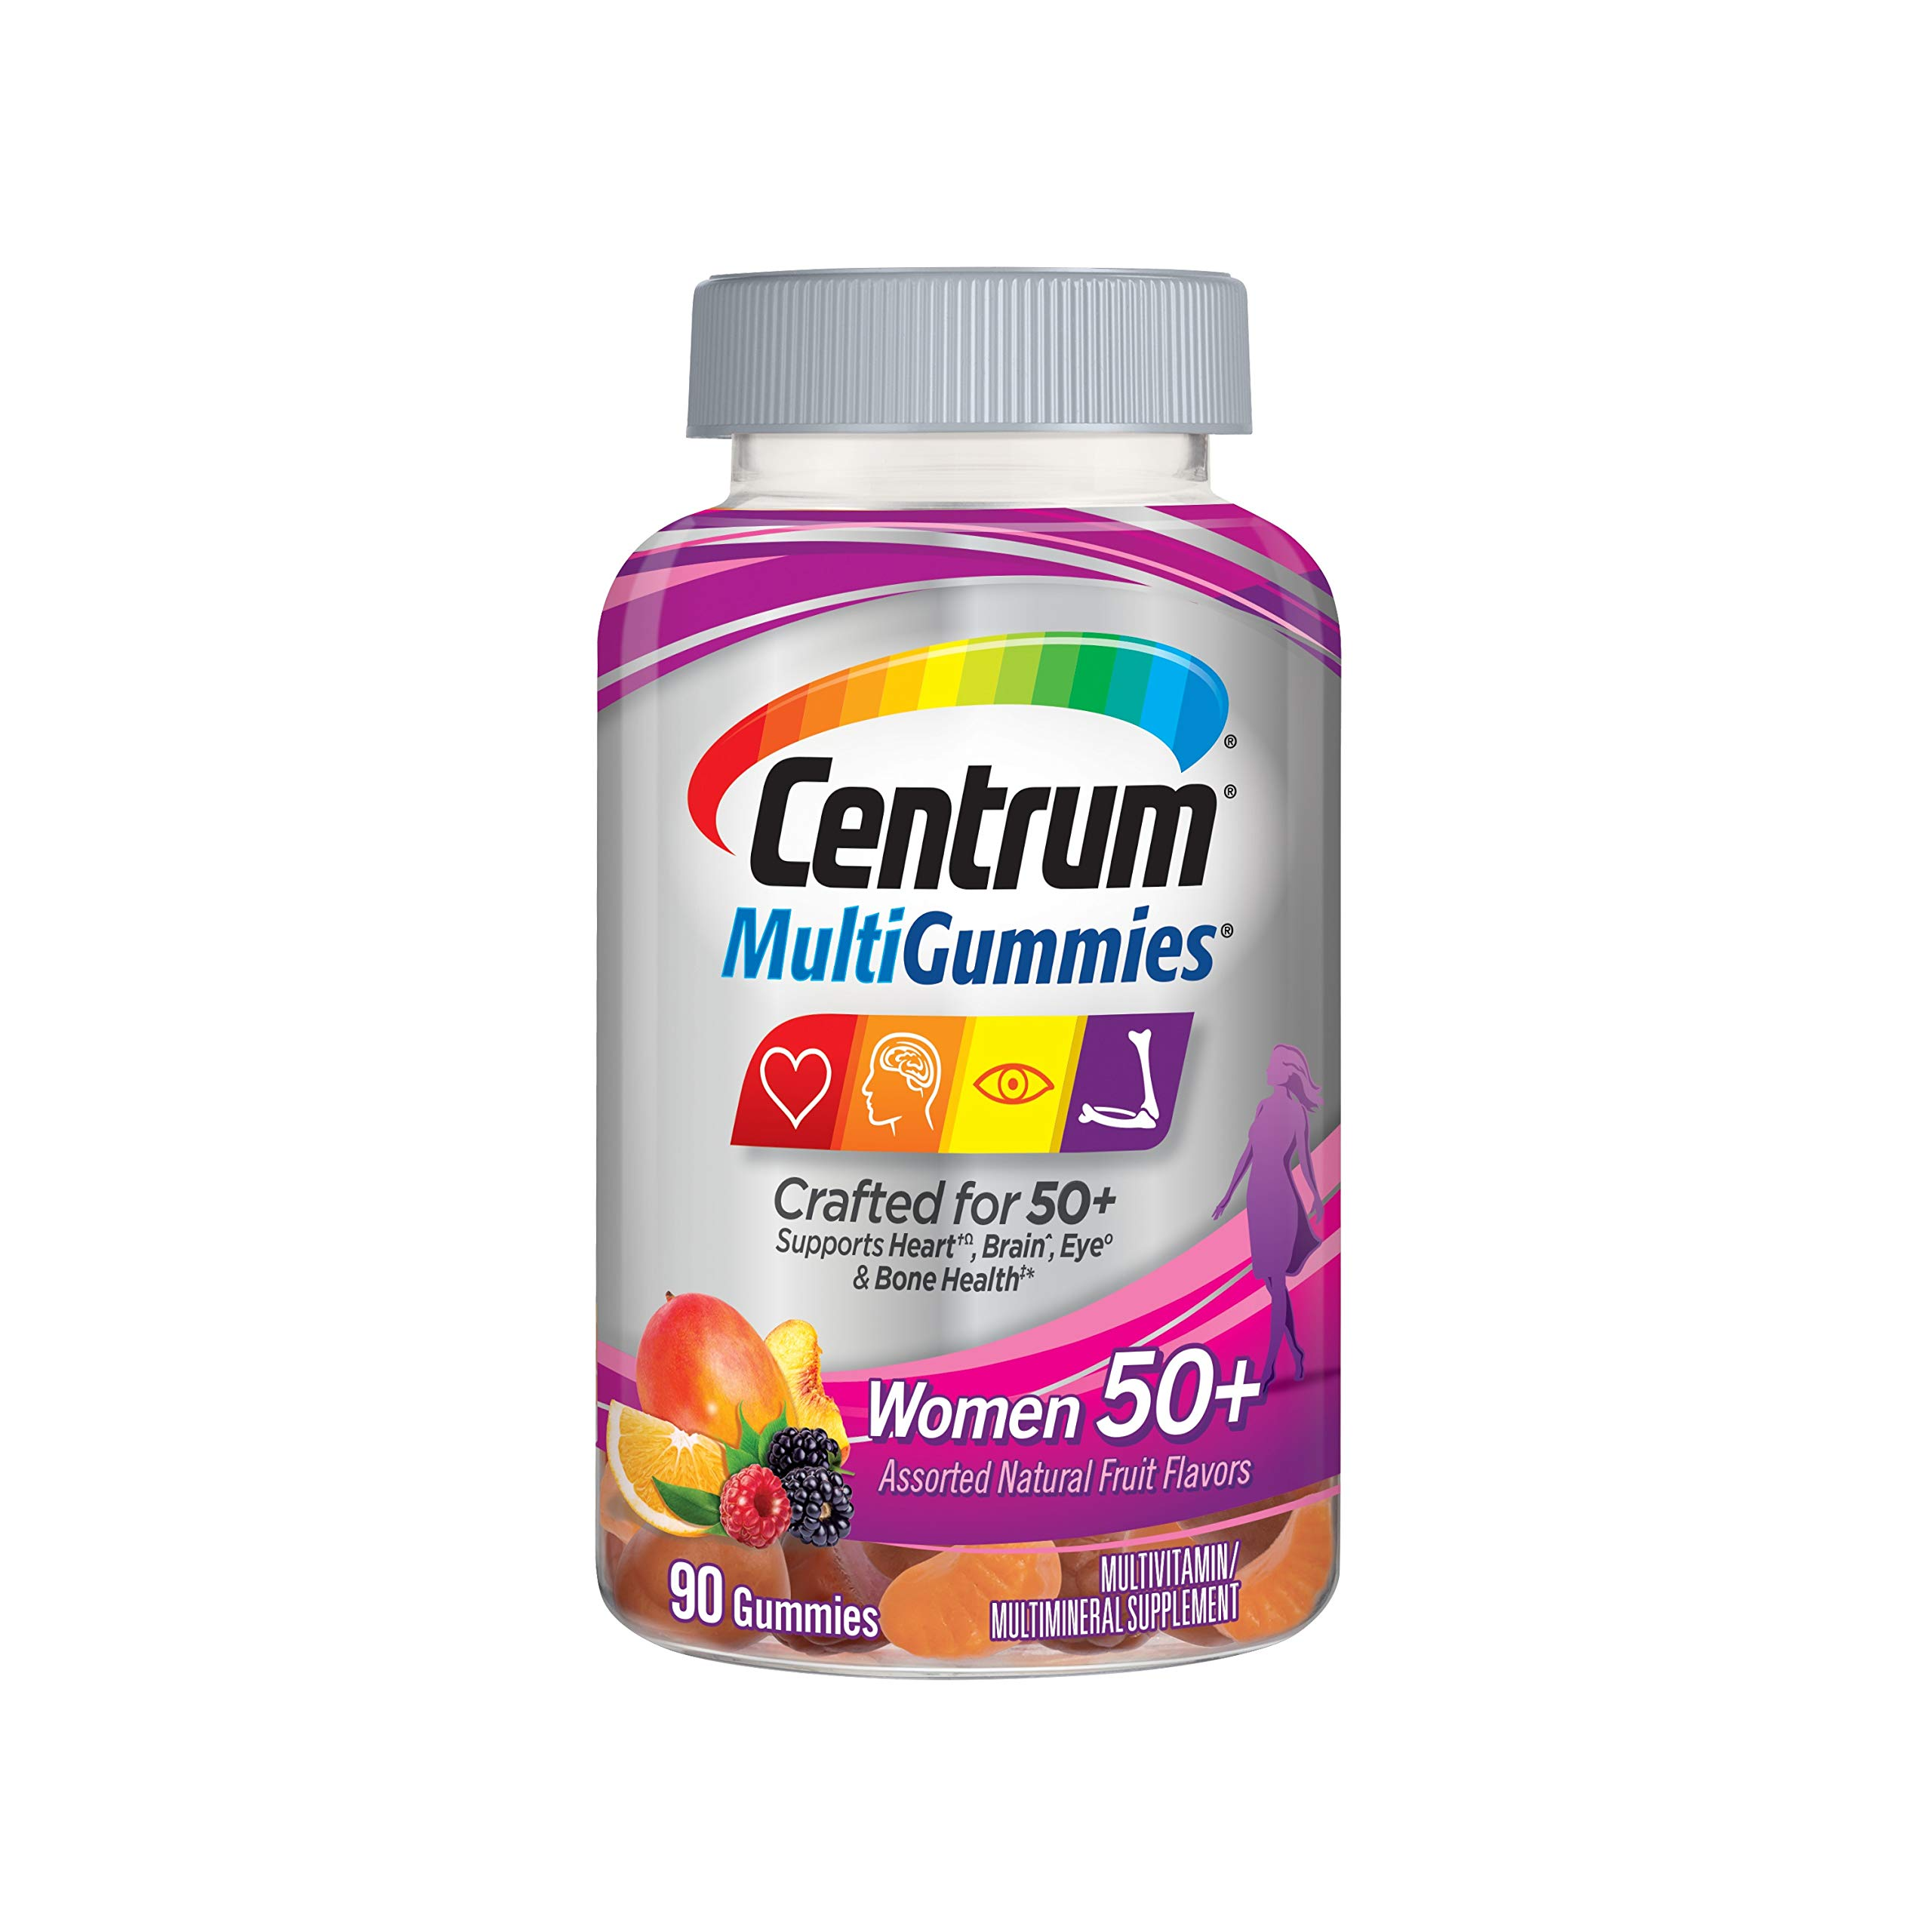 Centrum MultiGummies Gummy Multivitamin for Women 50 Plus, with Vitamin D3, B6 and B12, Multivitamin/Multimineral Supplement - 90 Count